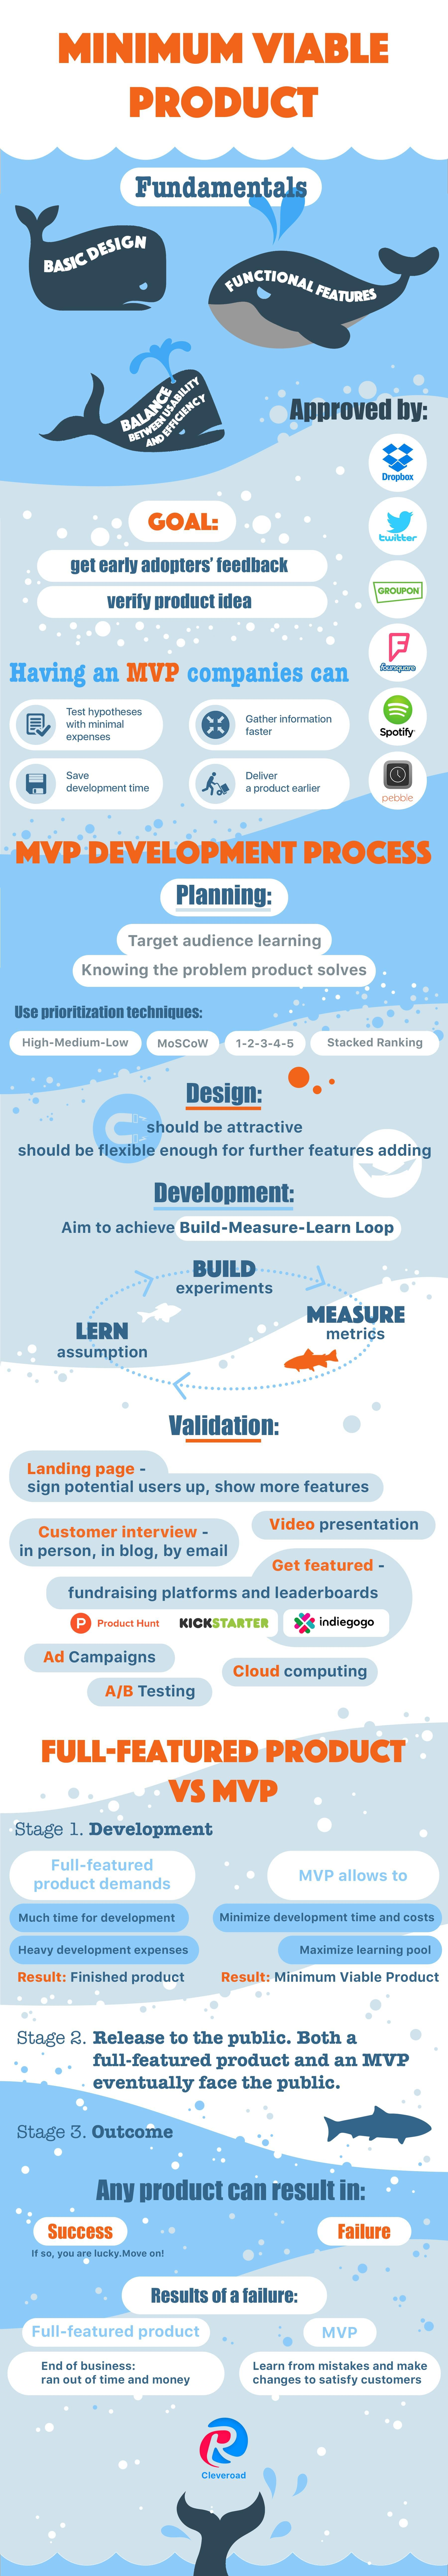 Mvt infographic